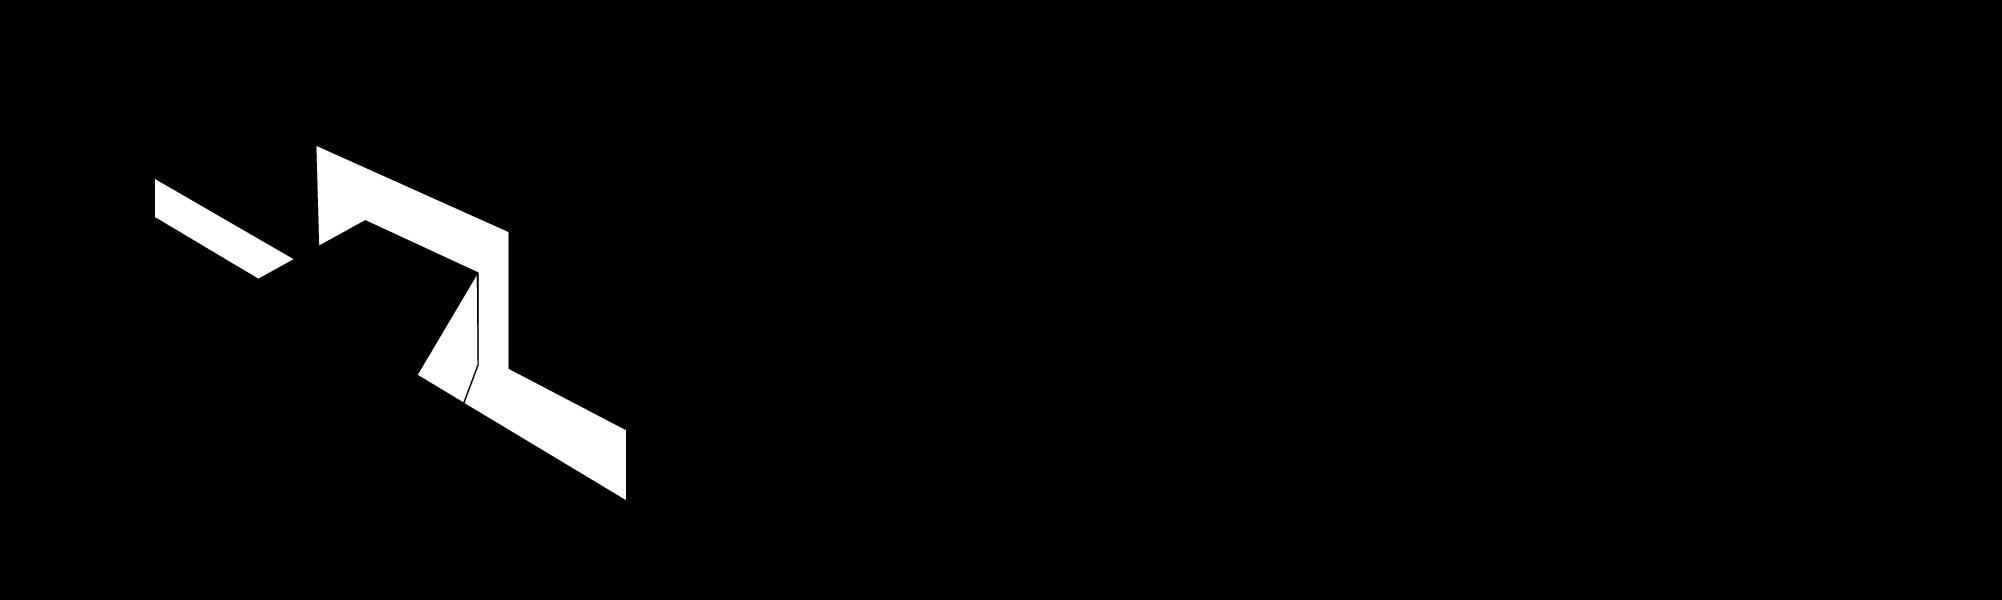 Tenon logo